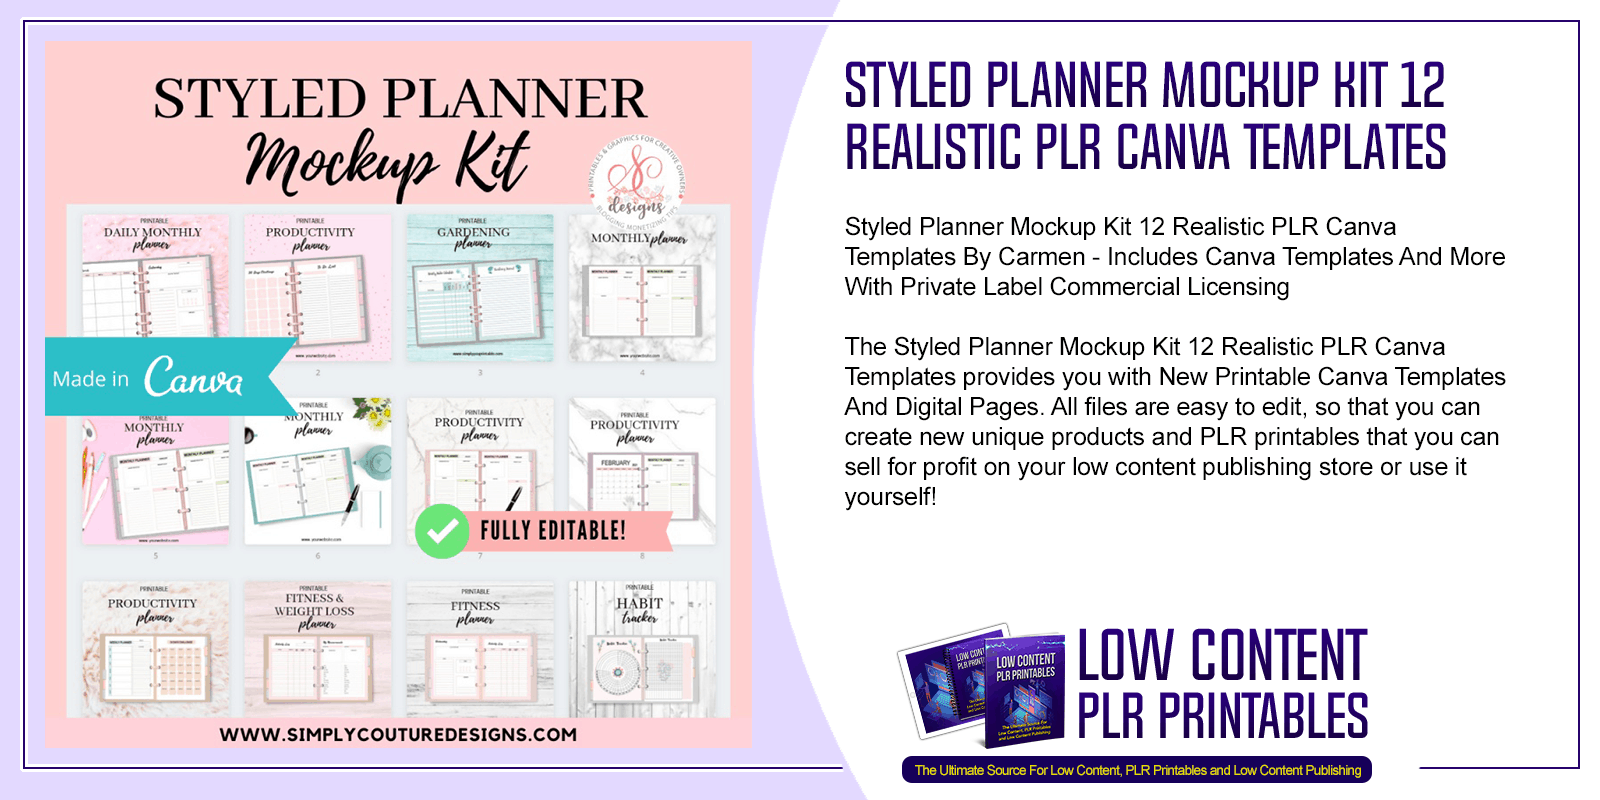 Styled Planner Mockup Kit 12 Realistic PLR Canva Templates